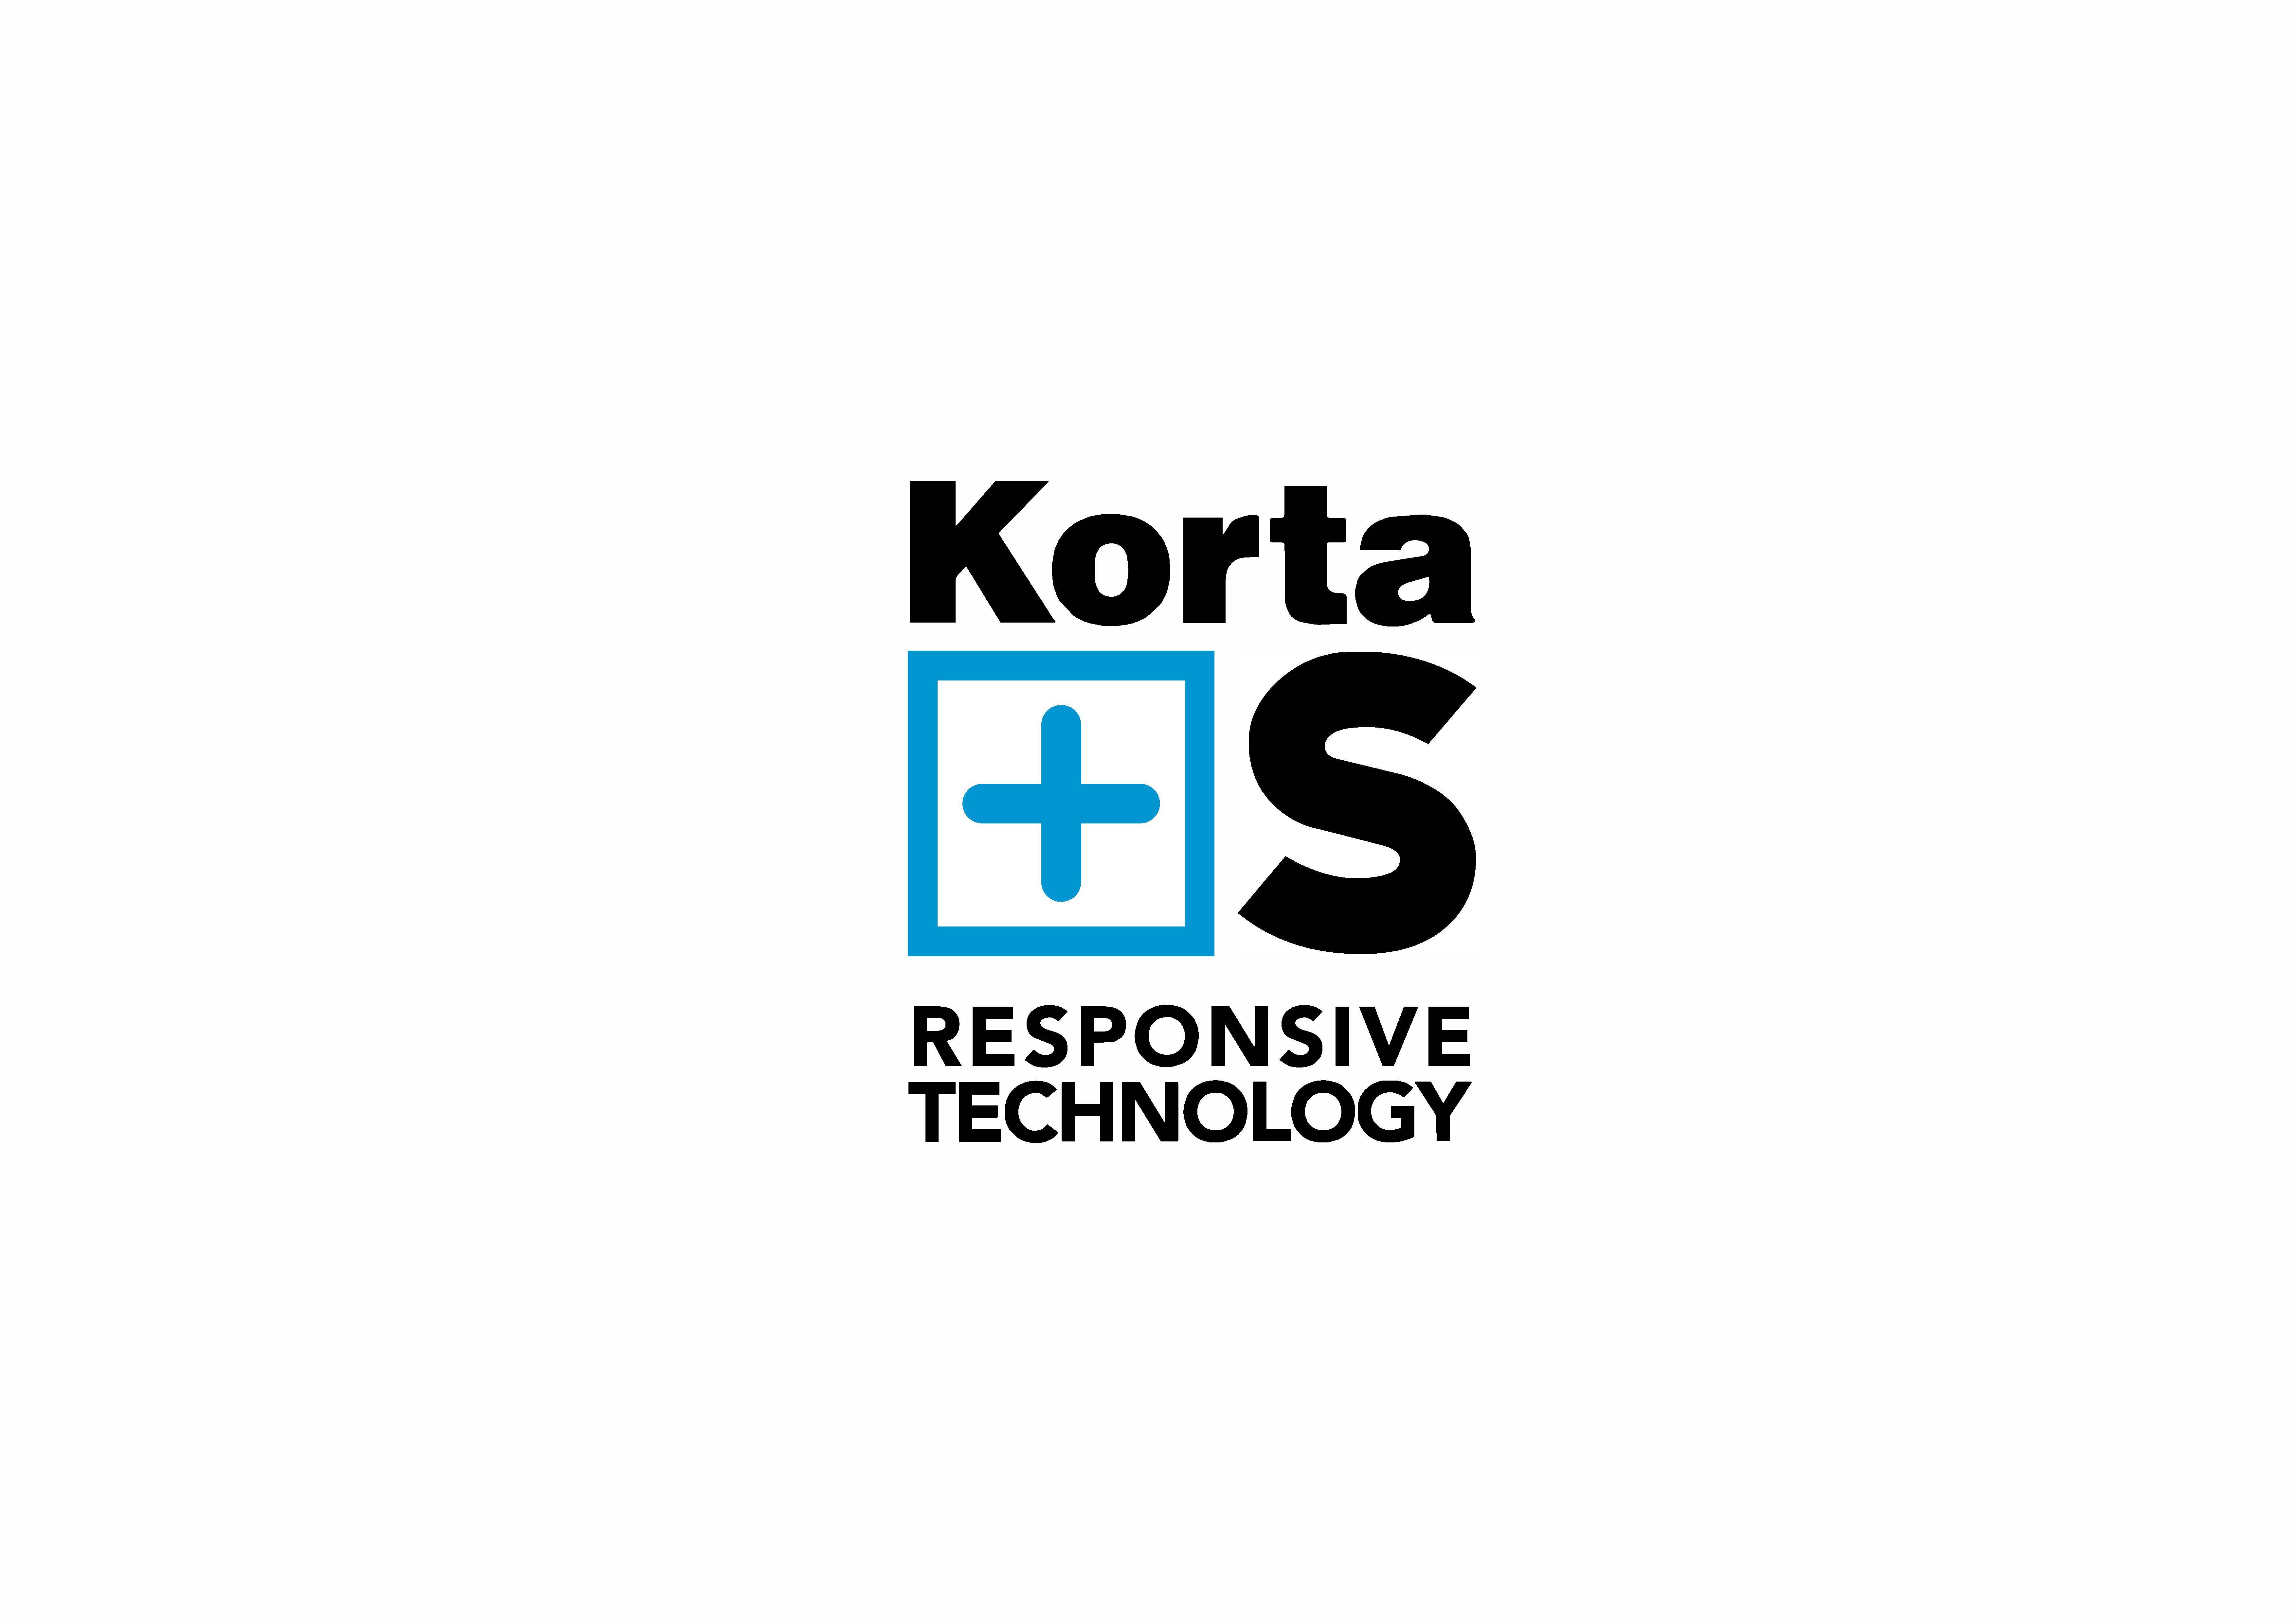 Descubre KORTA +S en #BIEMH2018 - BEC Barakaldo